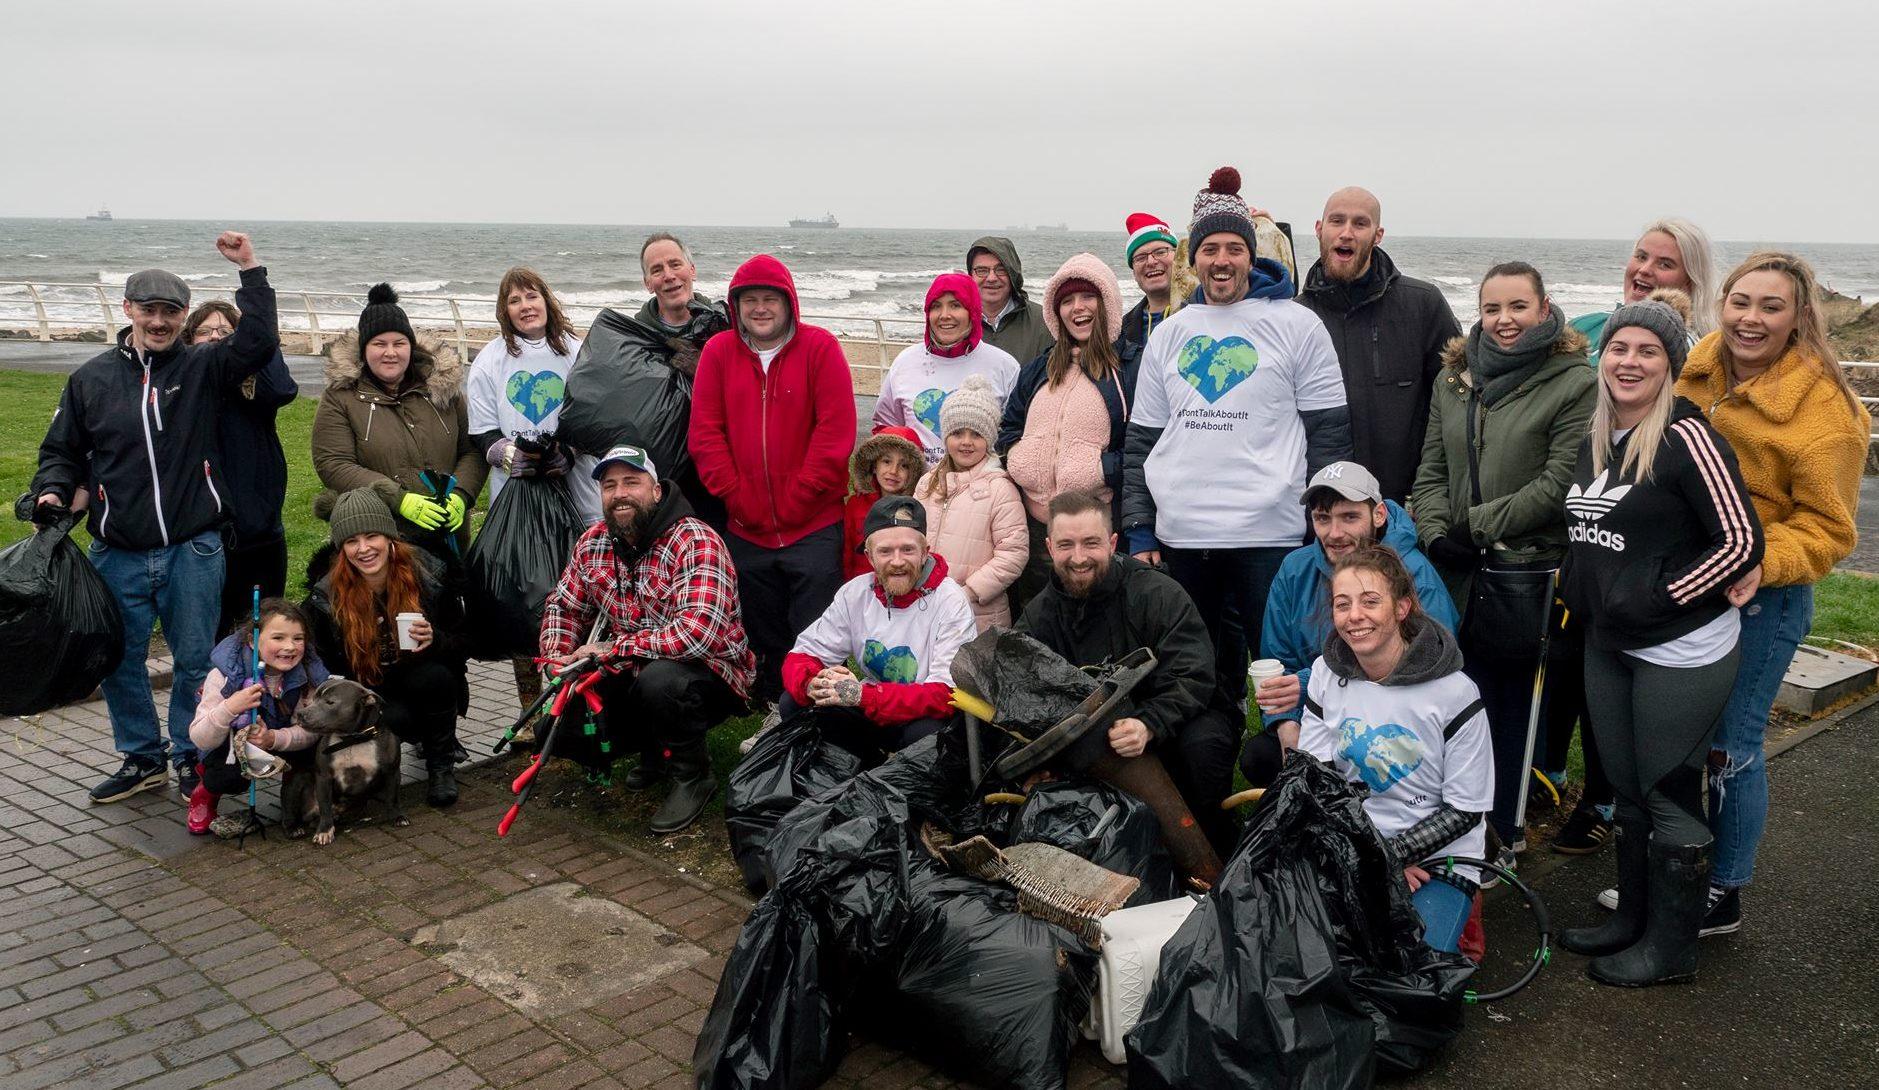 Revolution Barbershop Beach Clean litter pickers at Kirkcaldy